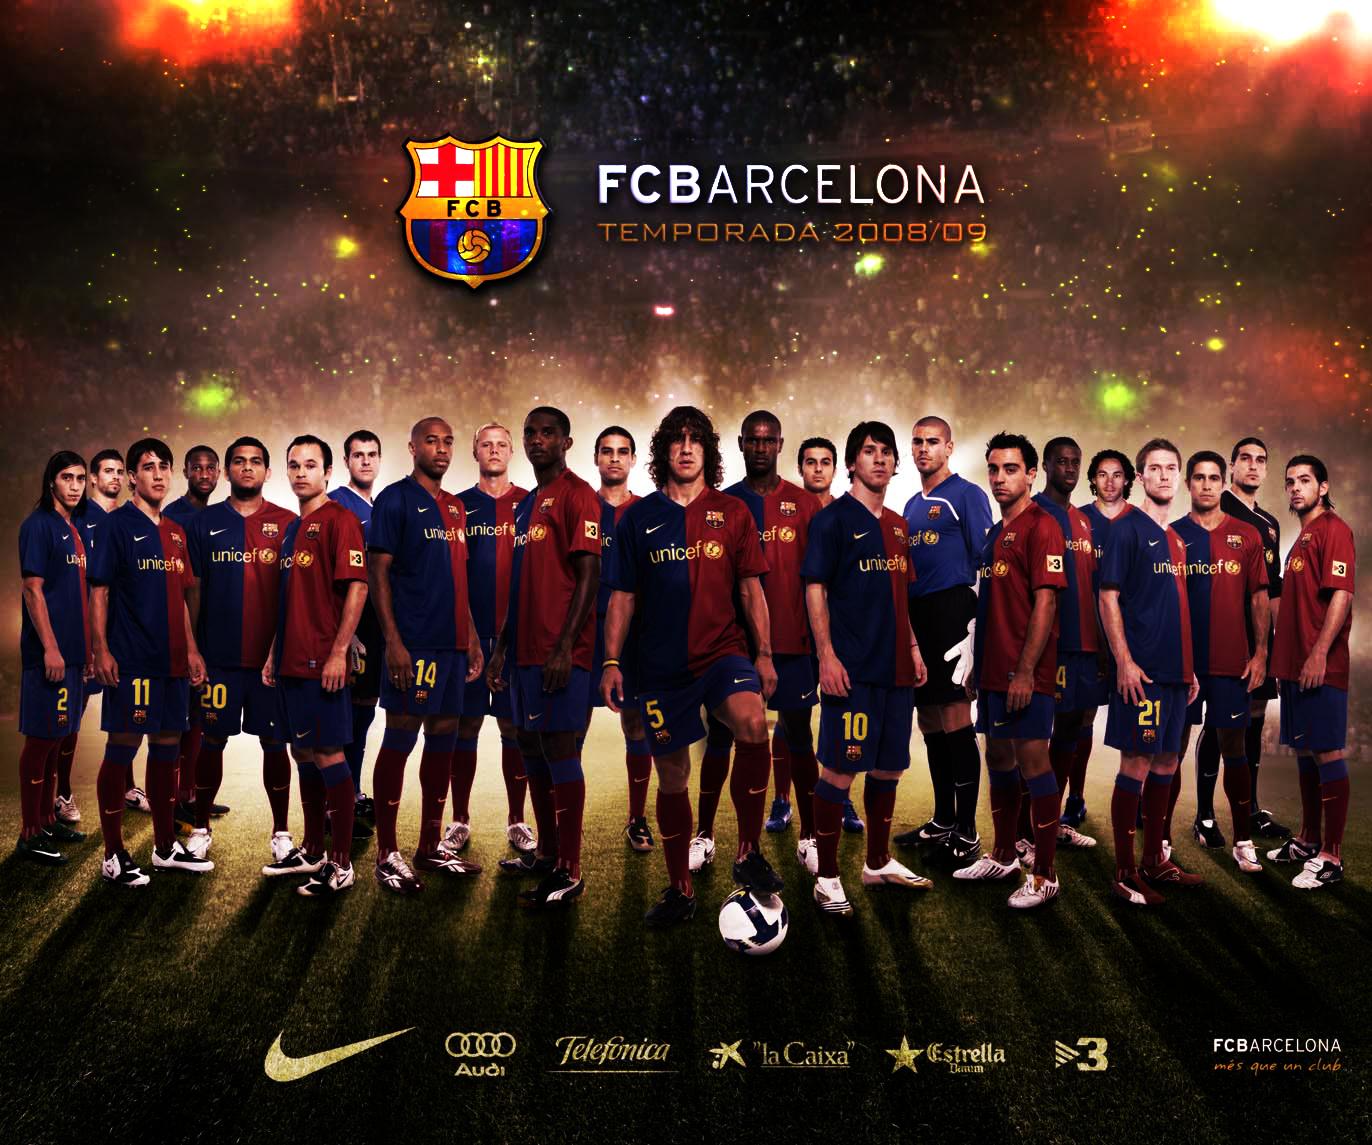 Fc Barcelona Team Wallpaper 1